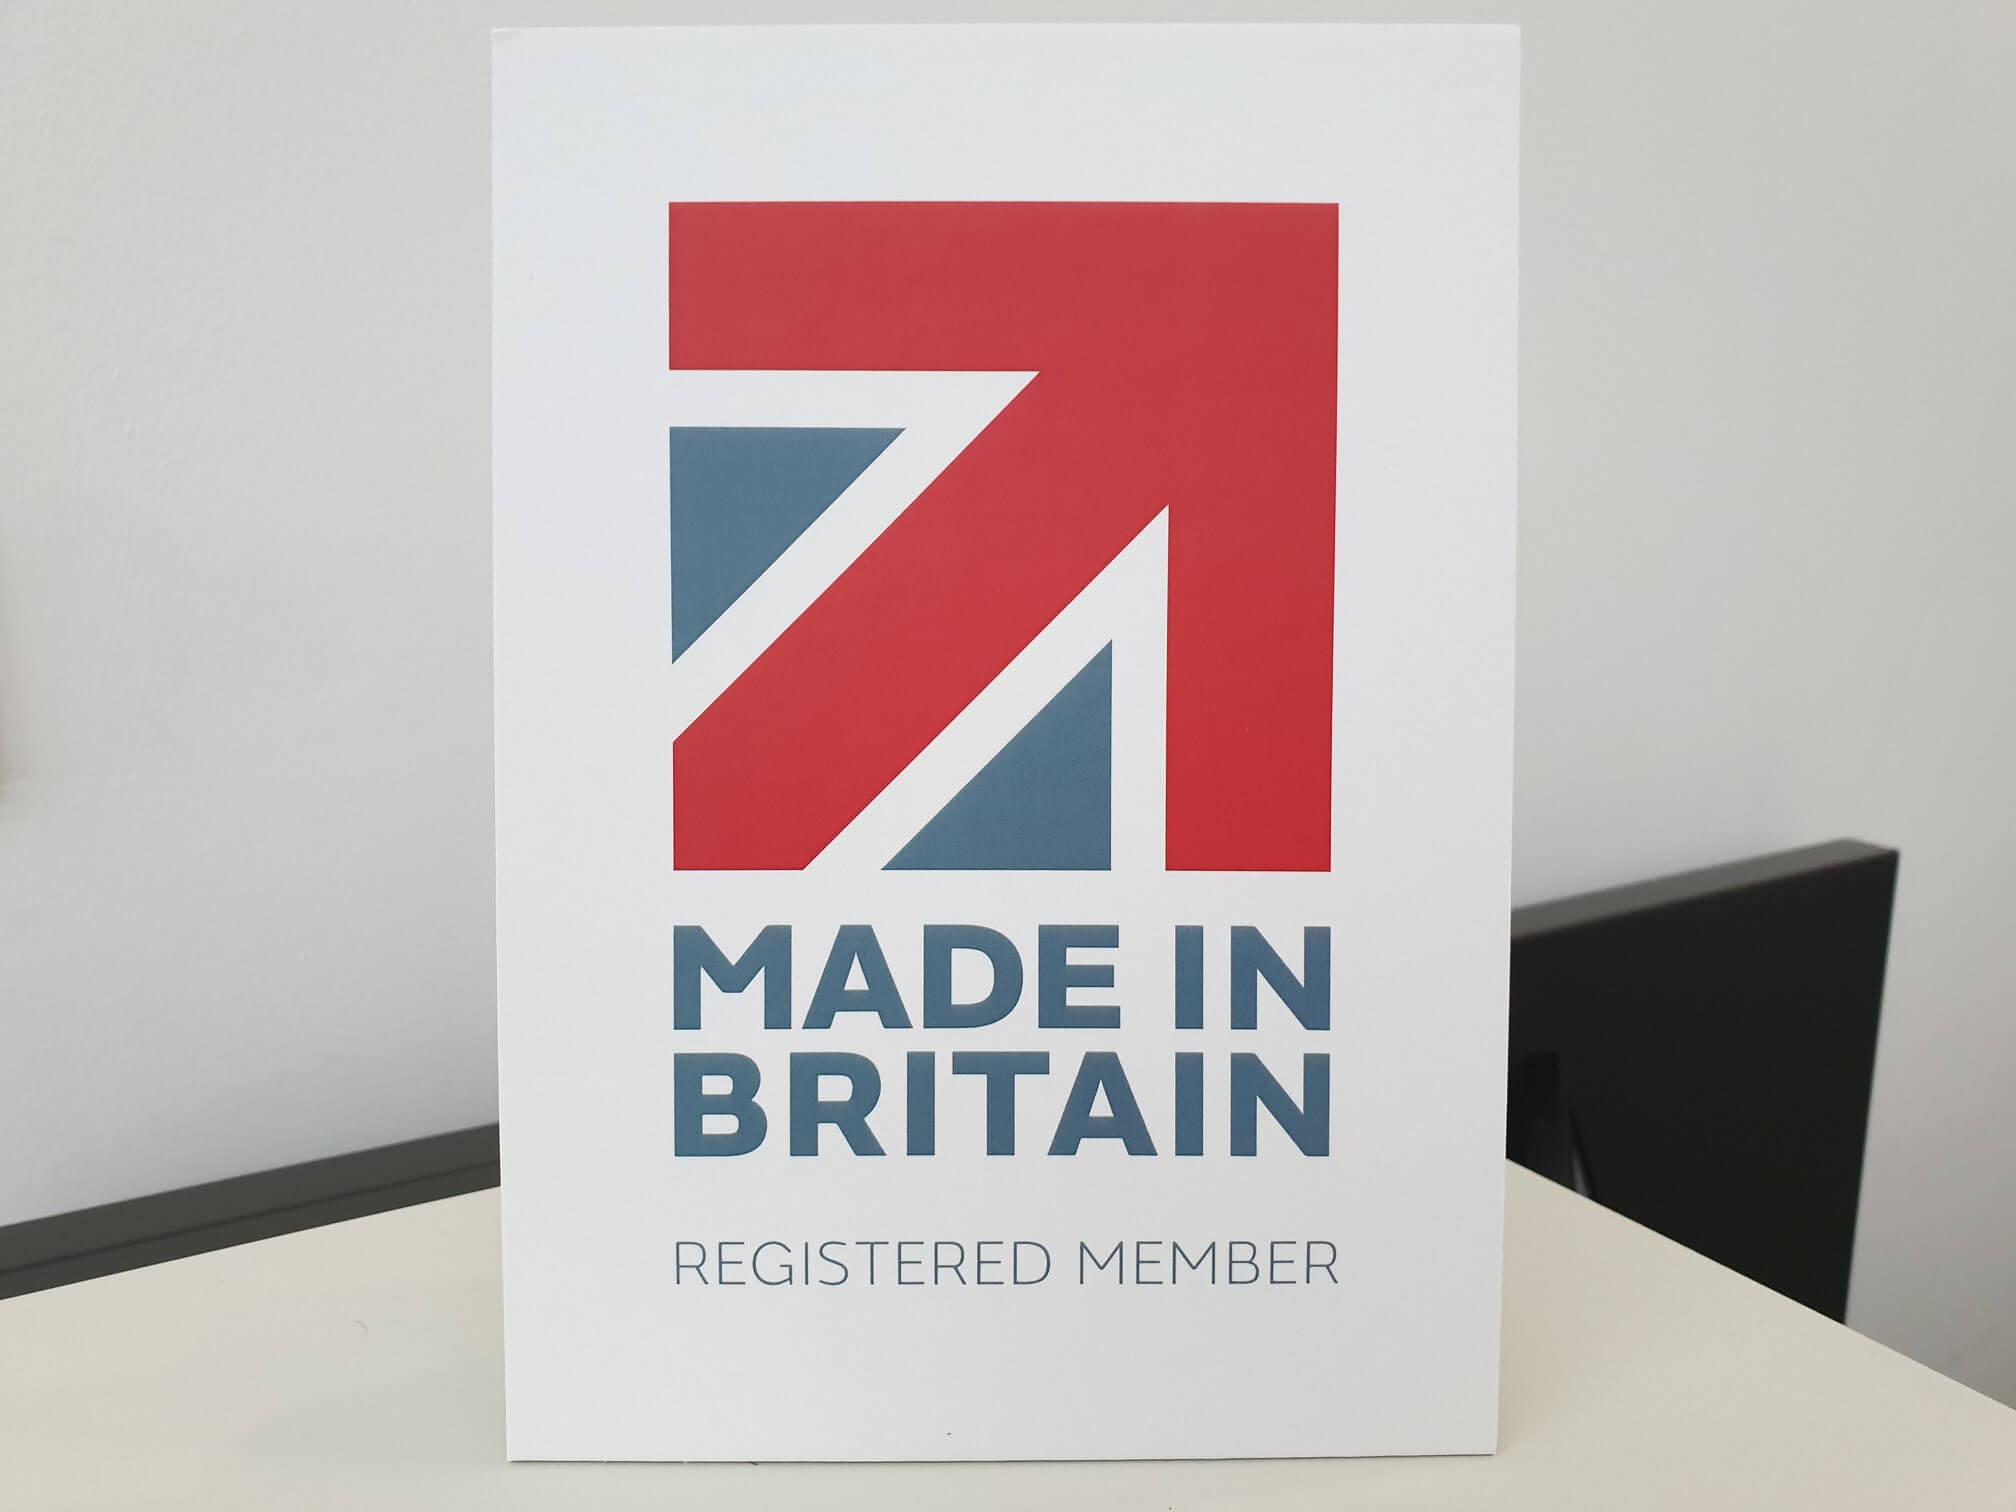 CMS Cepcor получил официальный знак MADE IN BRITAIN